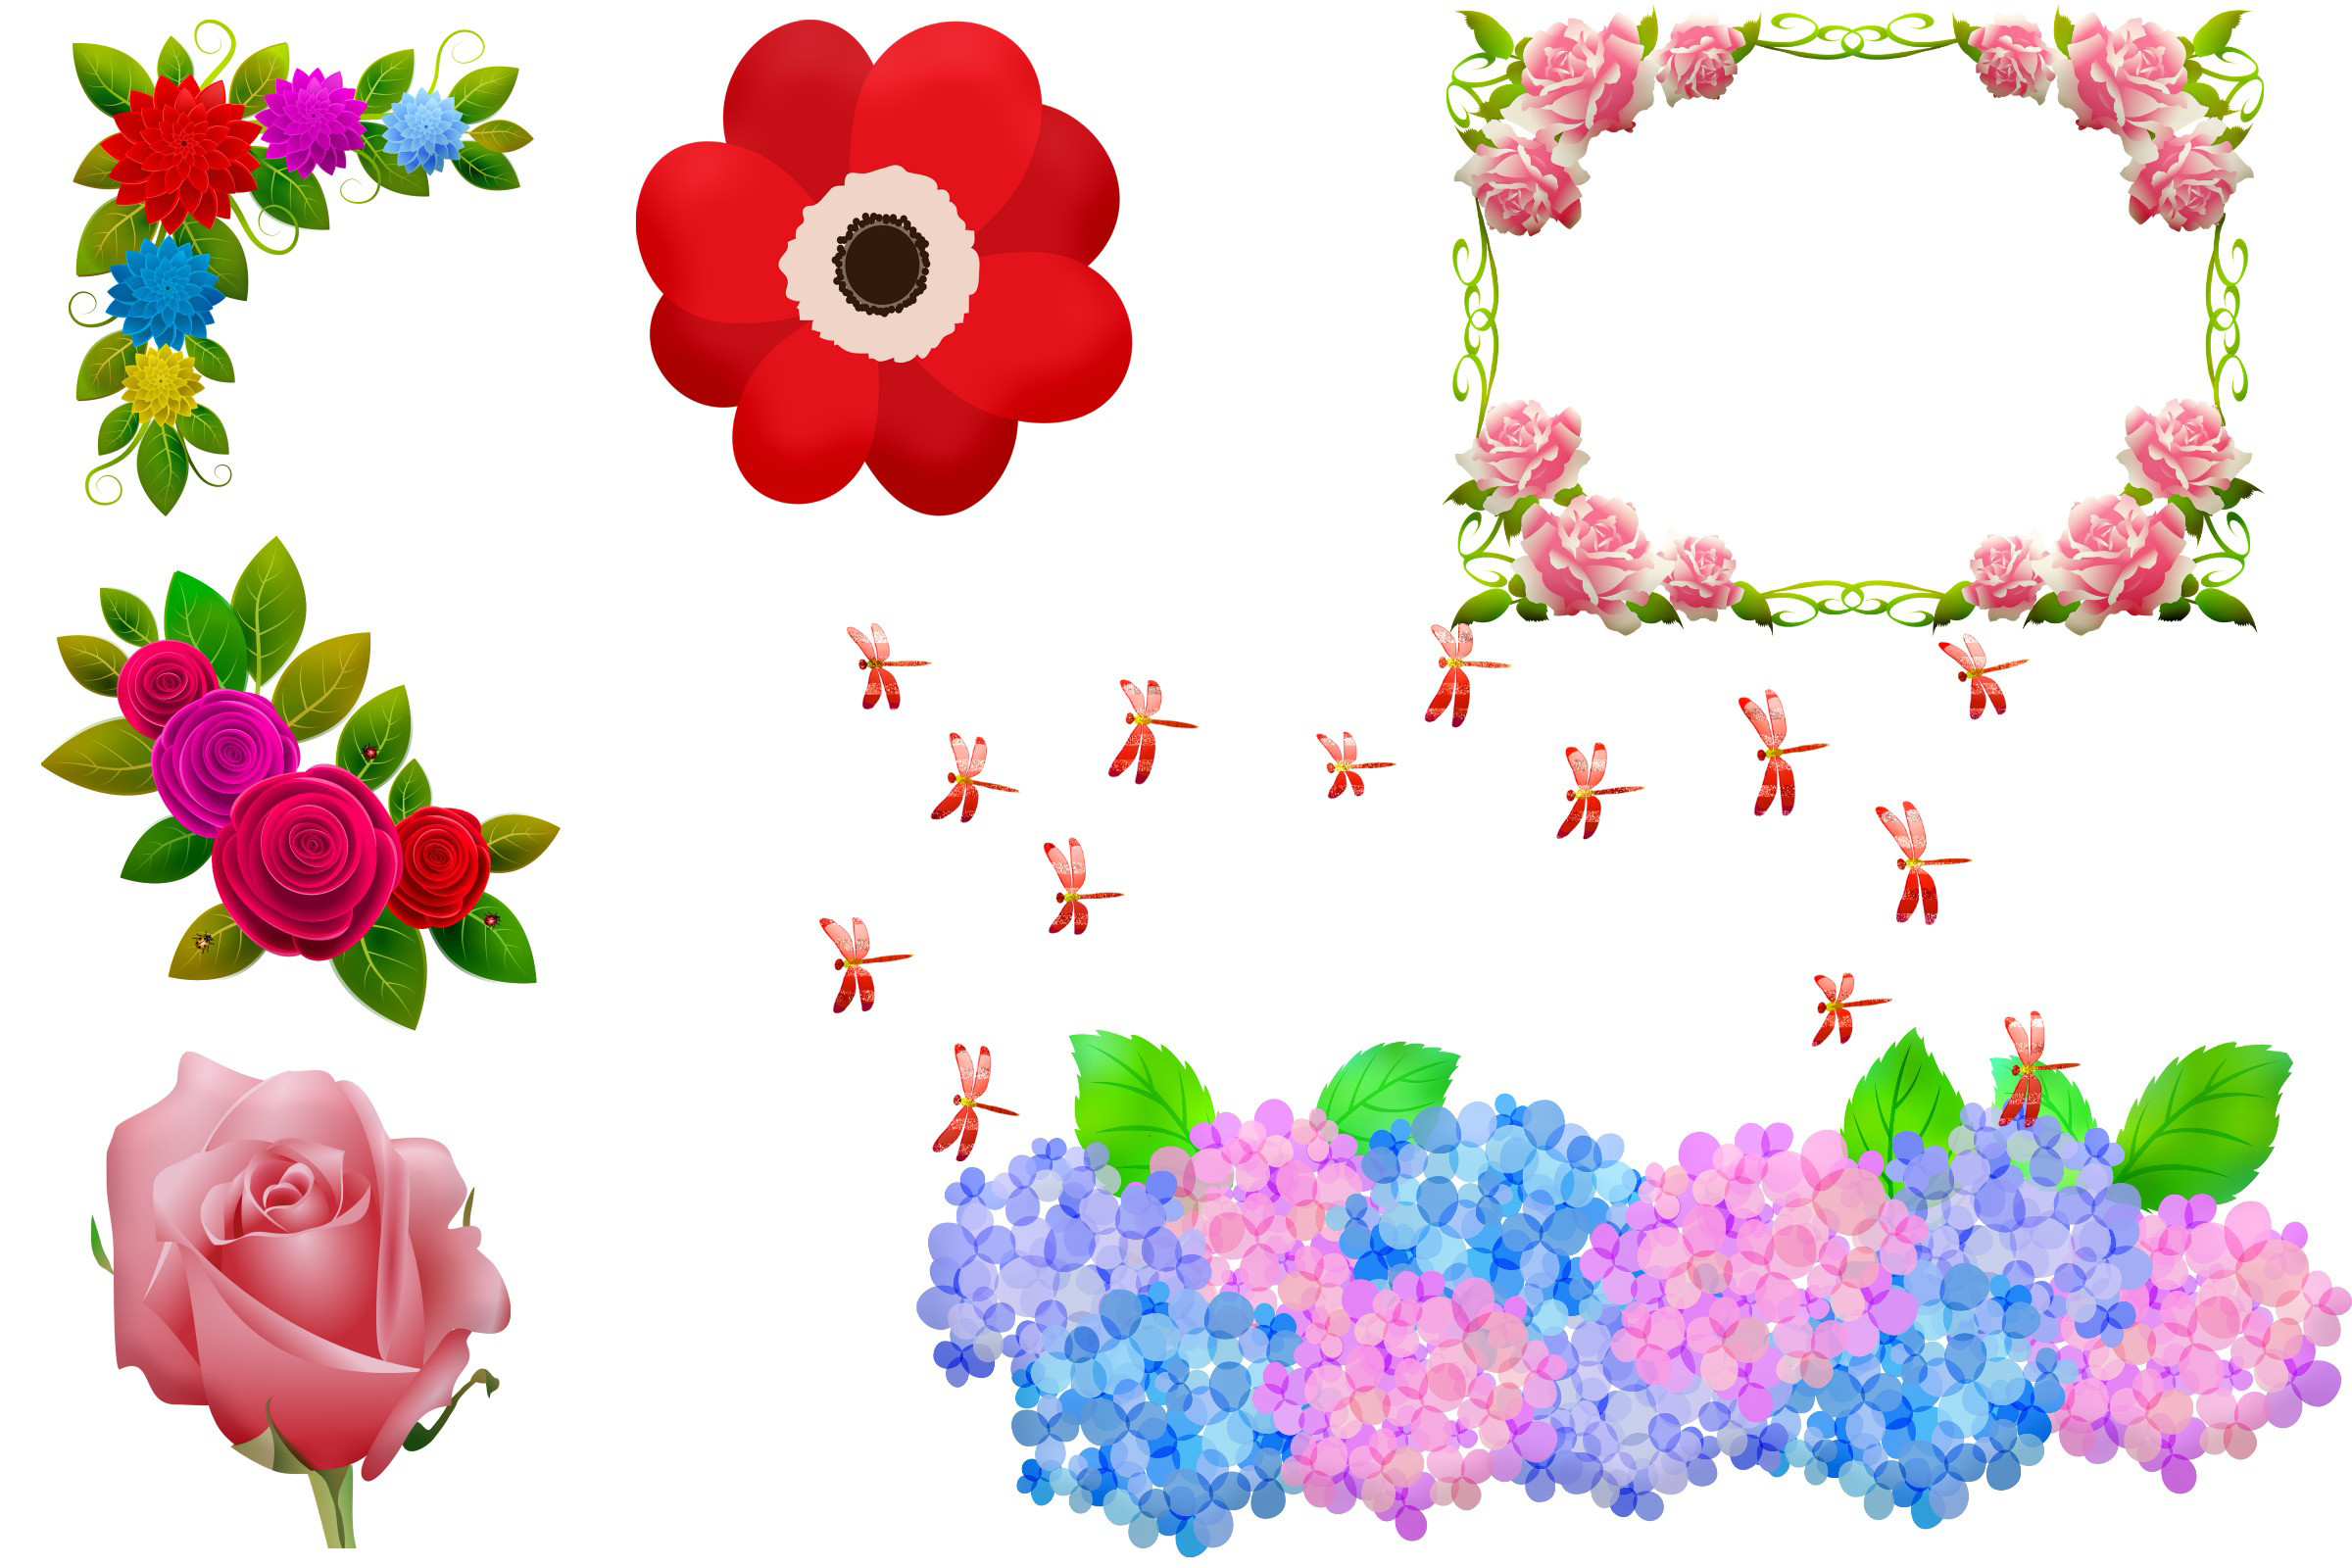 Summer Florals & Elements Clip Art example image 4